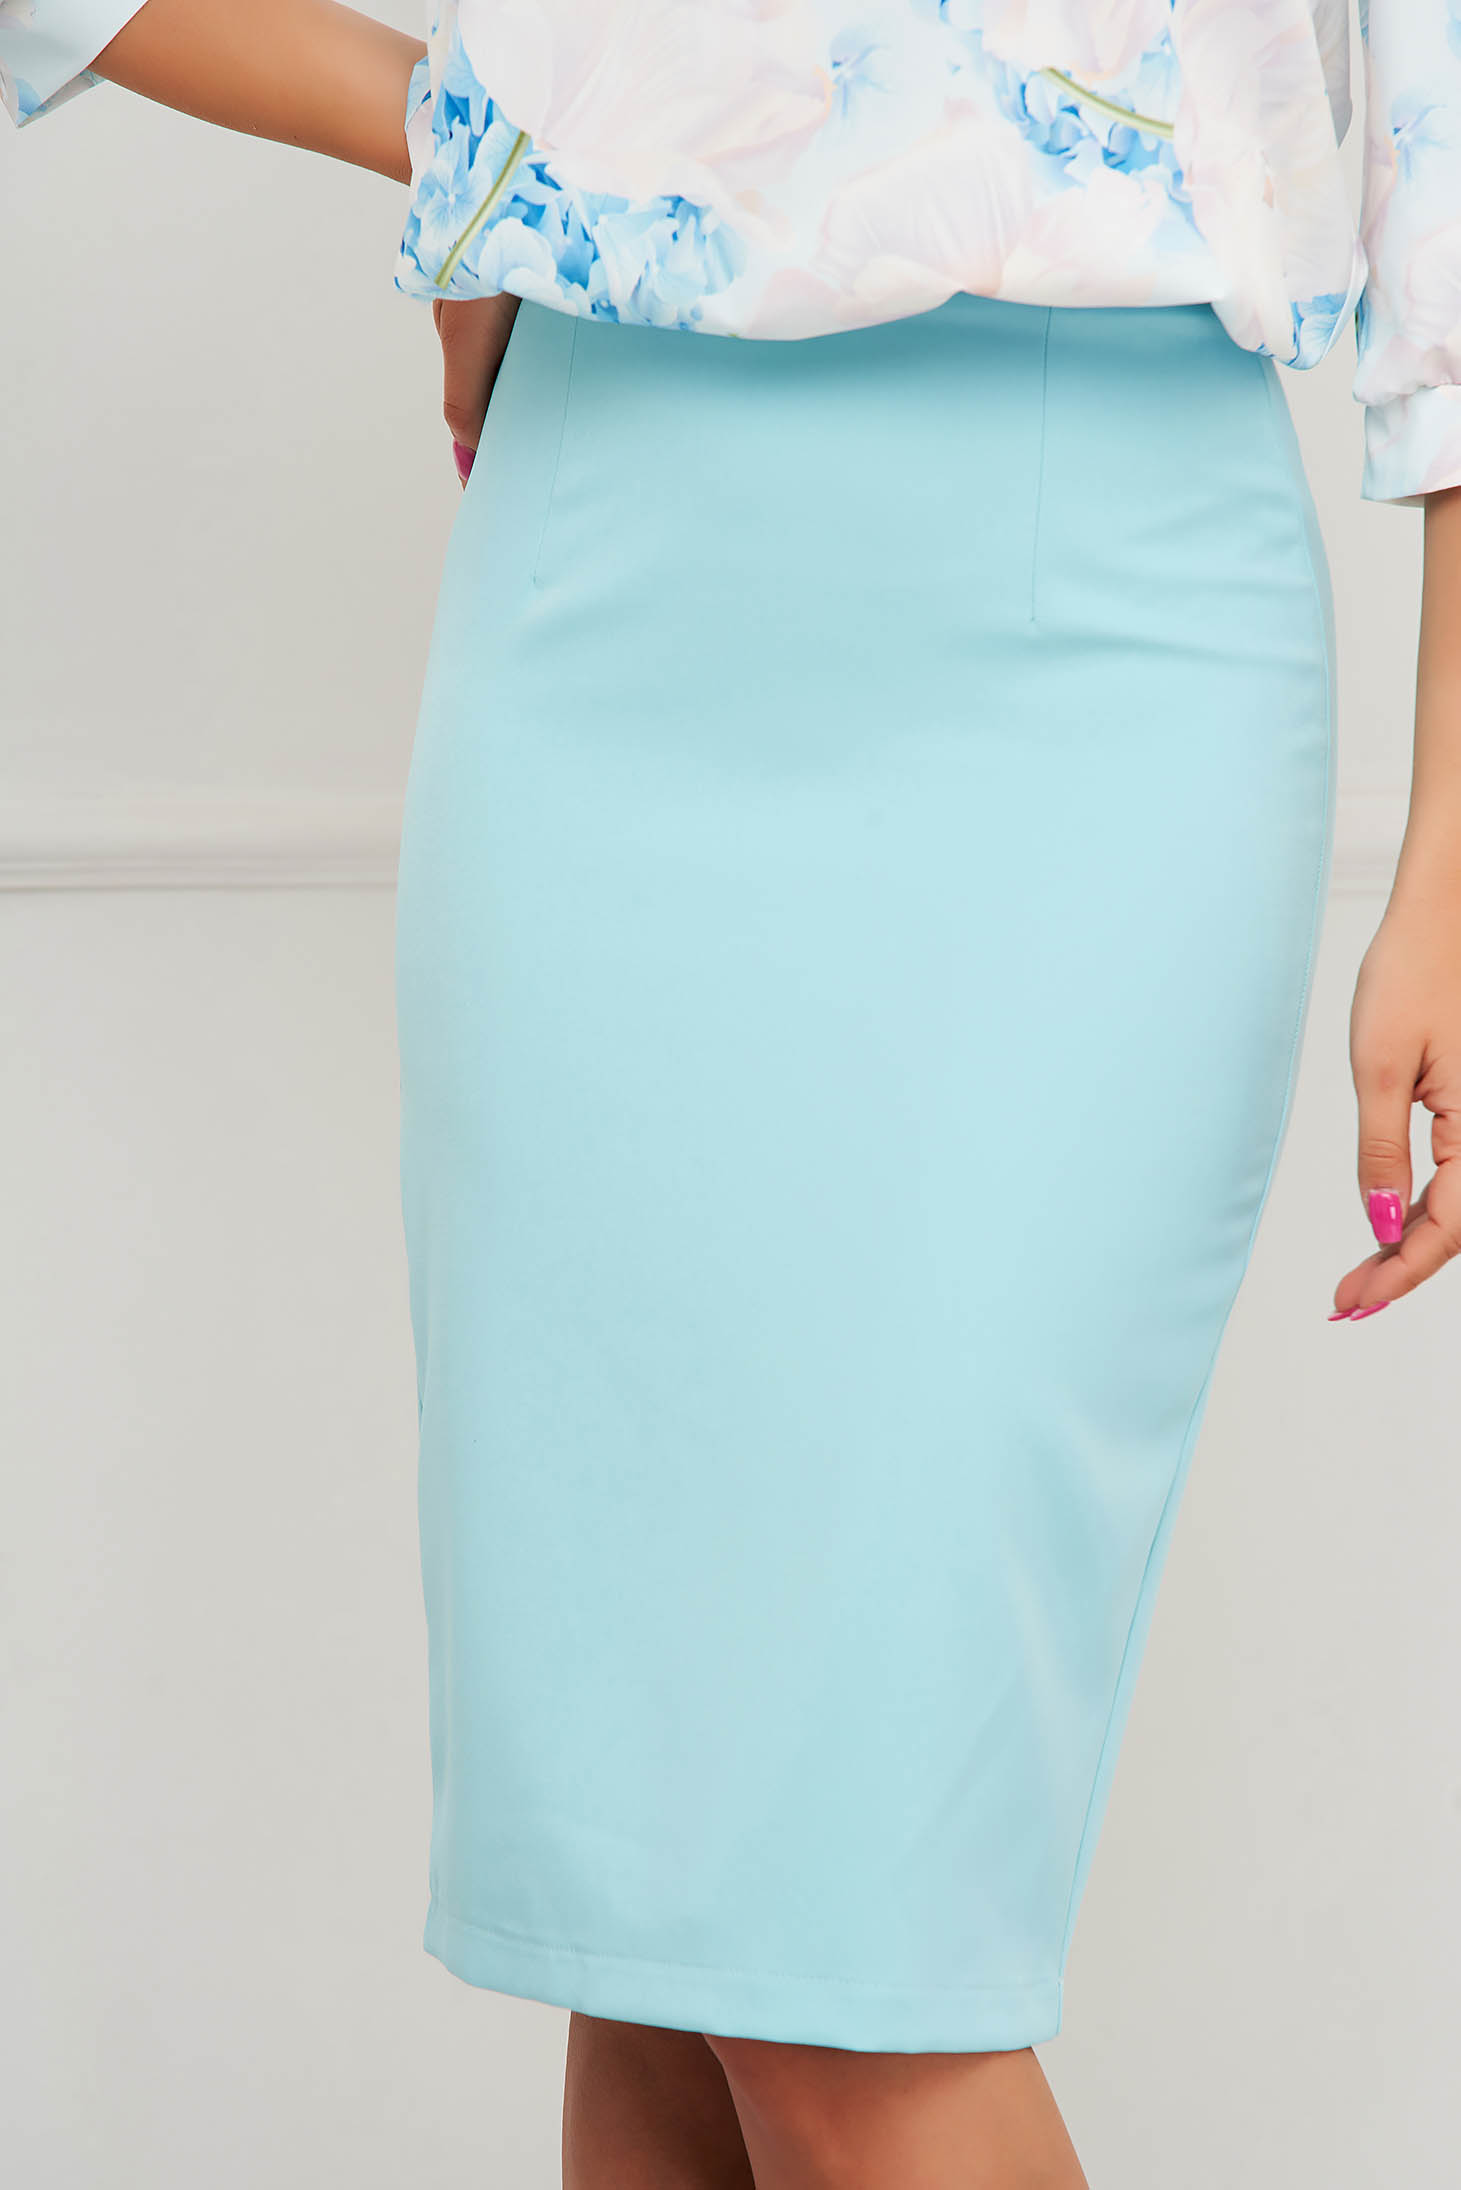 Fusta StarShinerS albastru aqua office midi tip creion din stofa elastica cu talie inalta